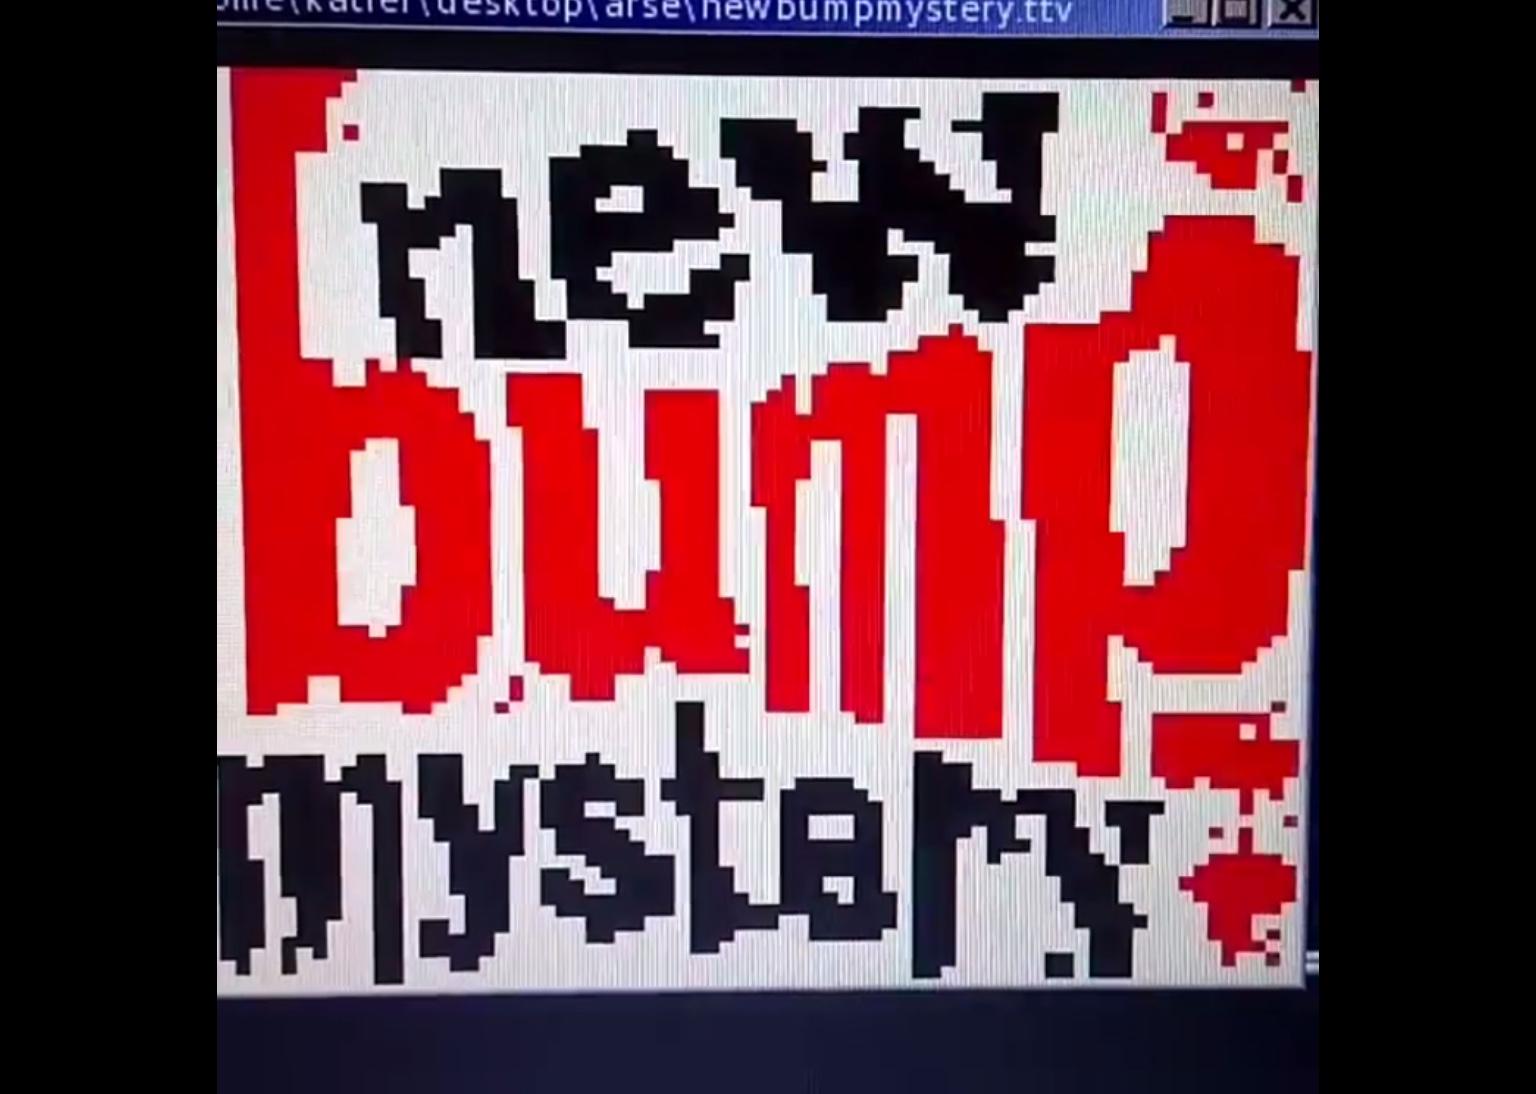 Bump Mystery, Kathrin Gunter